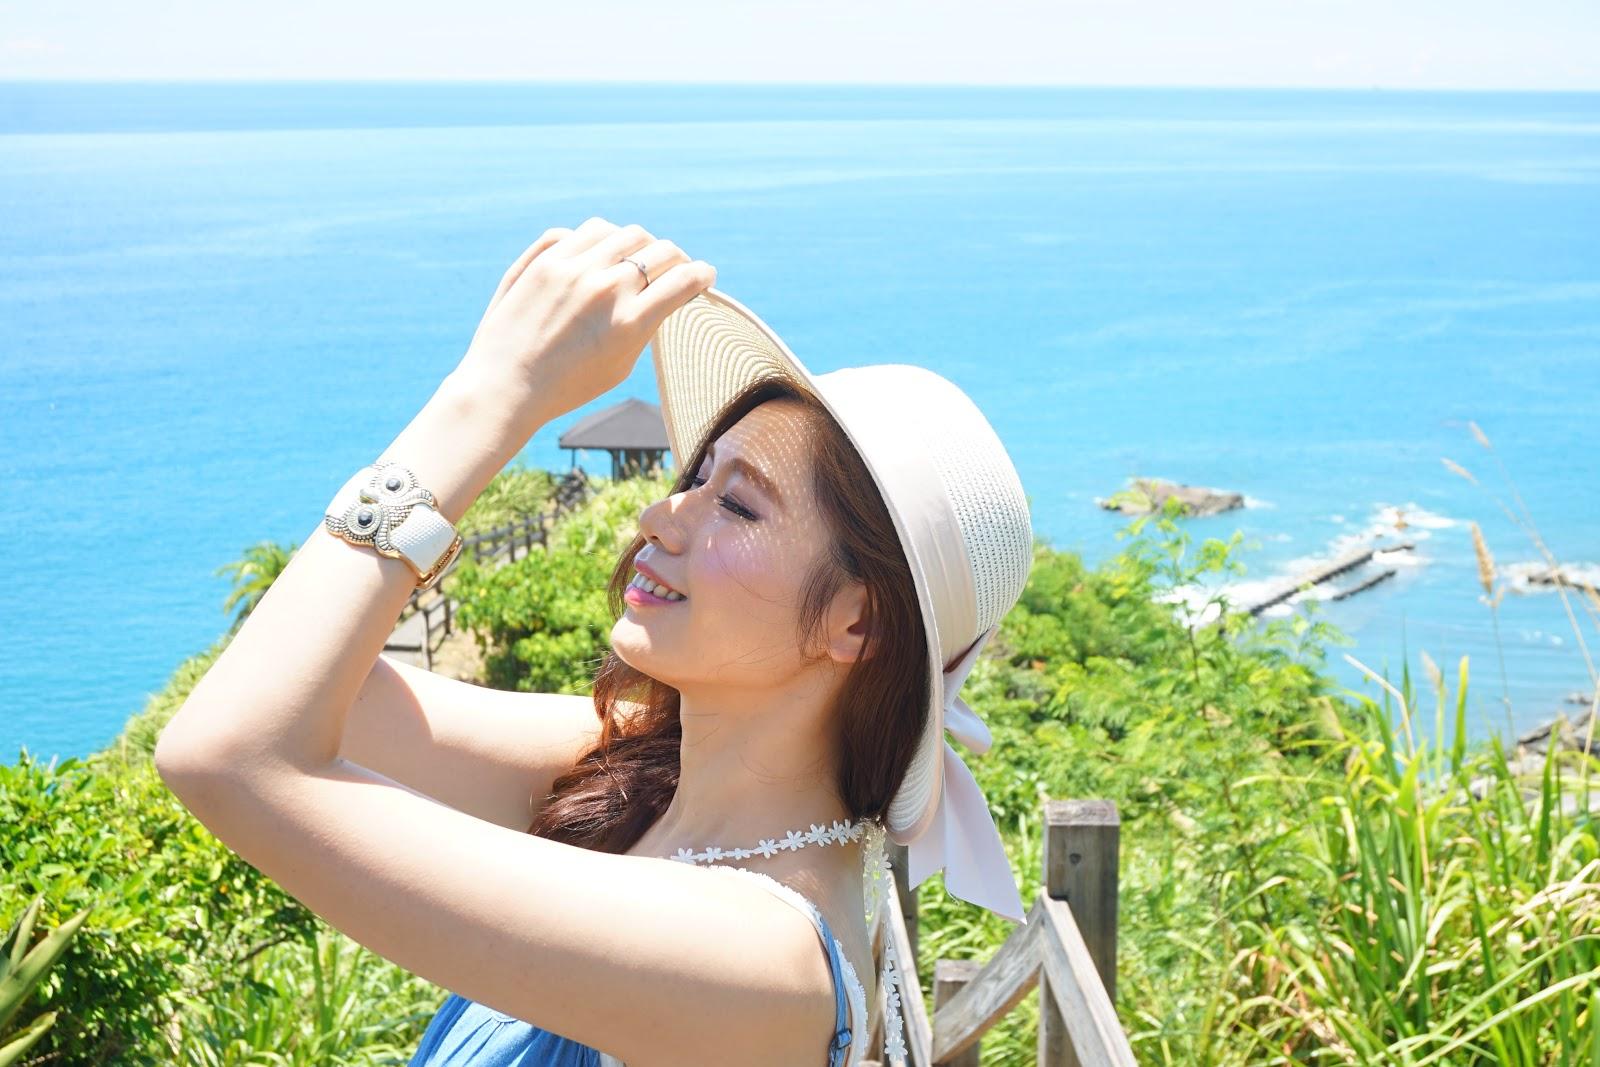 IMG_1788-beautyanxiety.com-hualien-travel-jici-kaluluwan